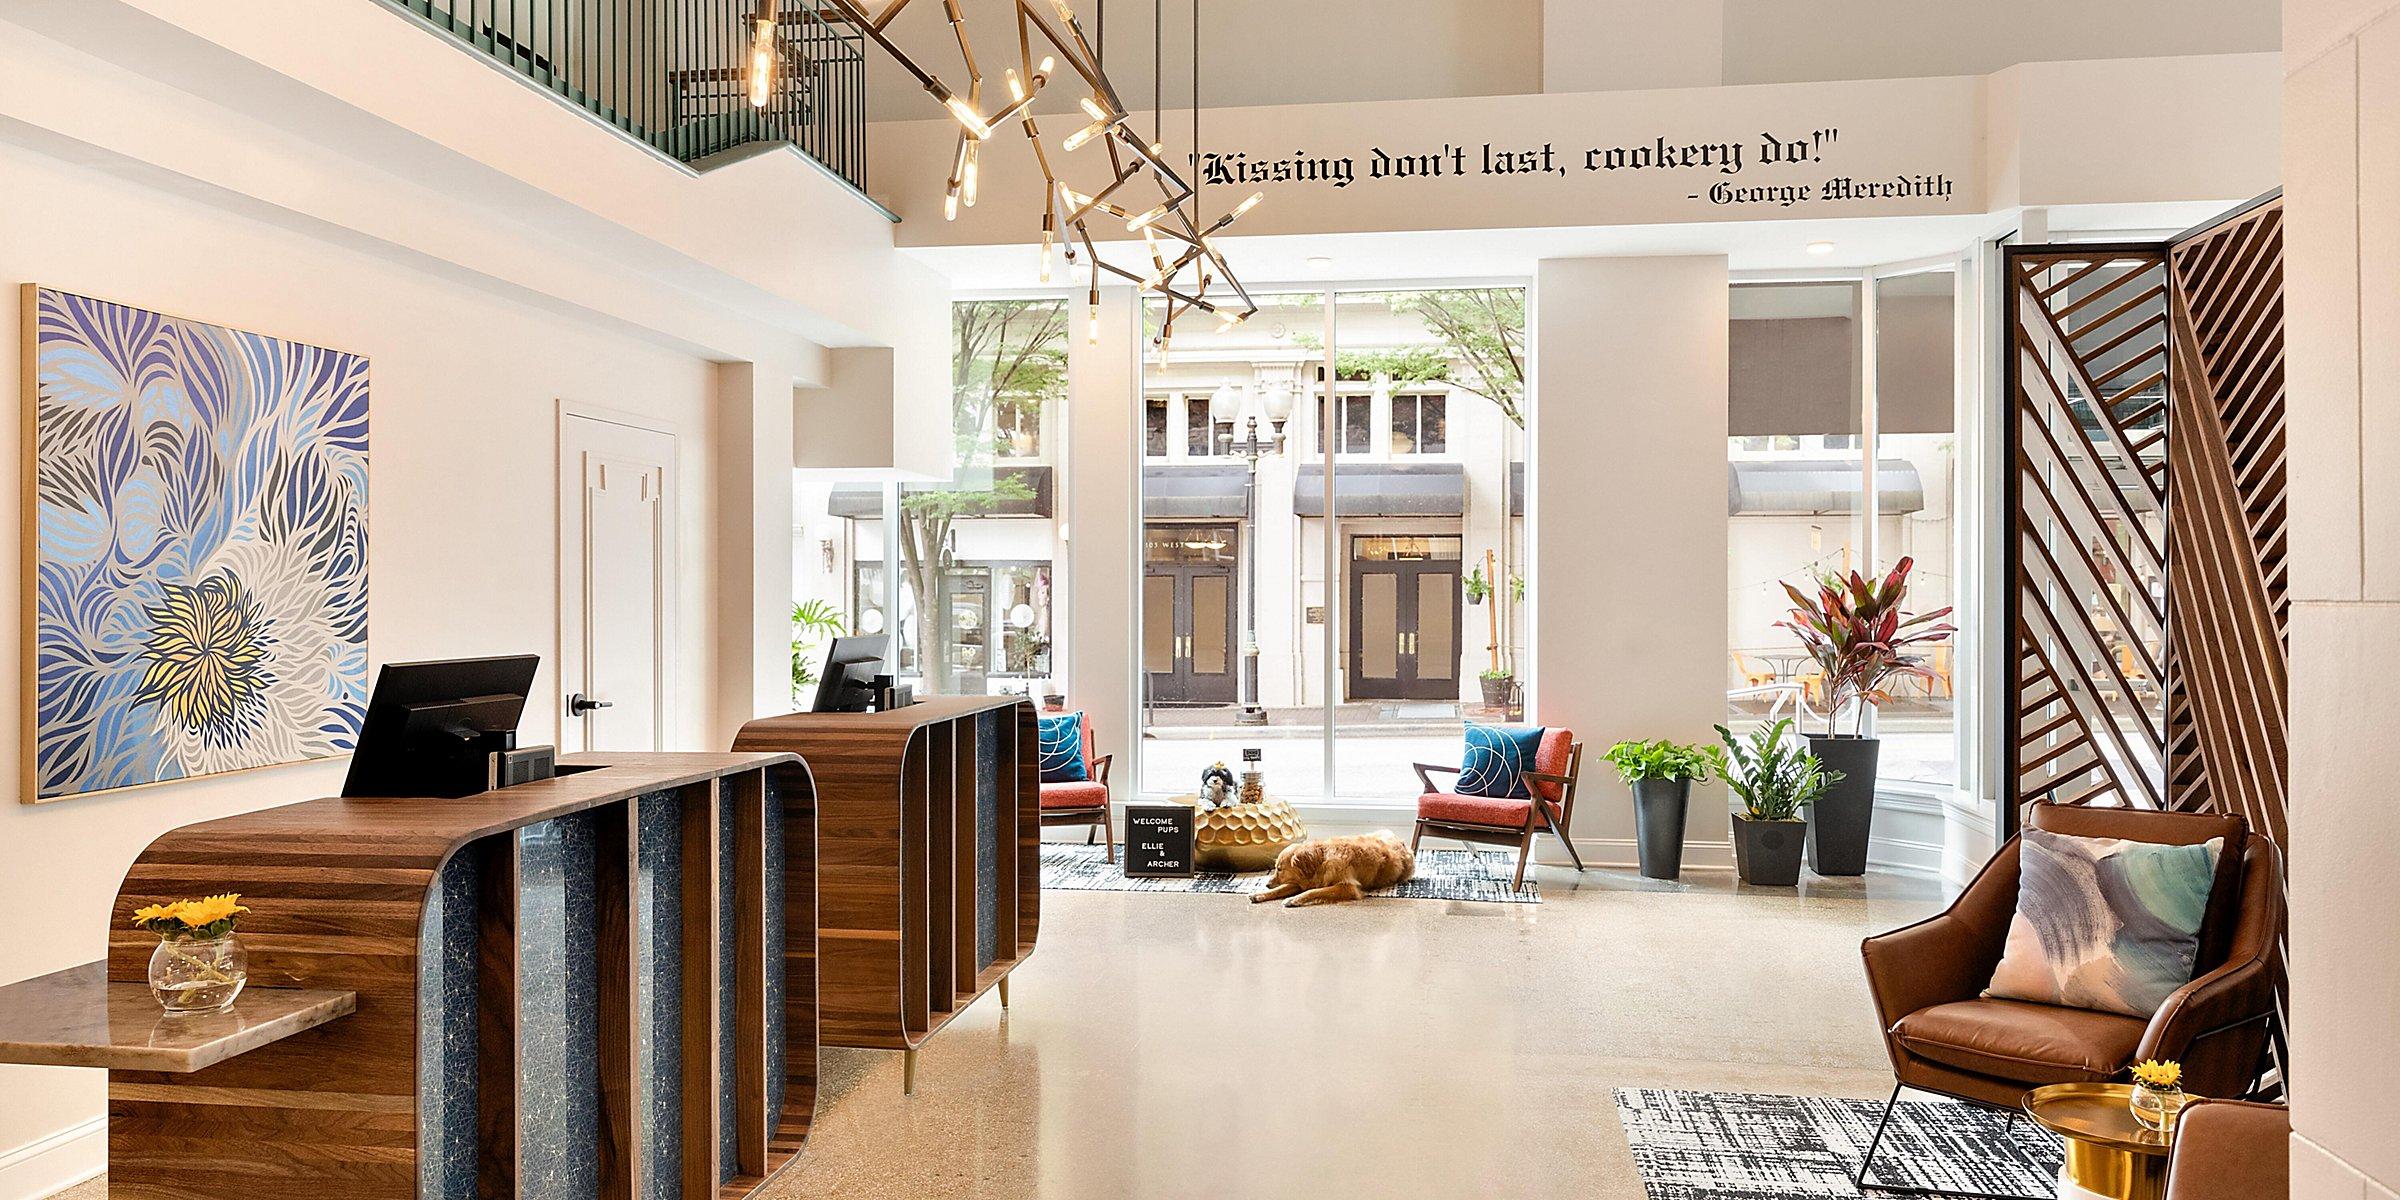 Boutique Hotels in Downtown Winston Salem | Hotel Indigo